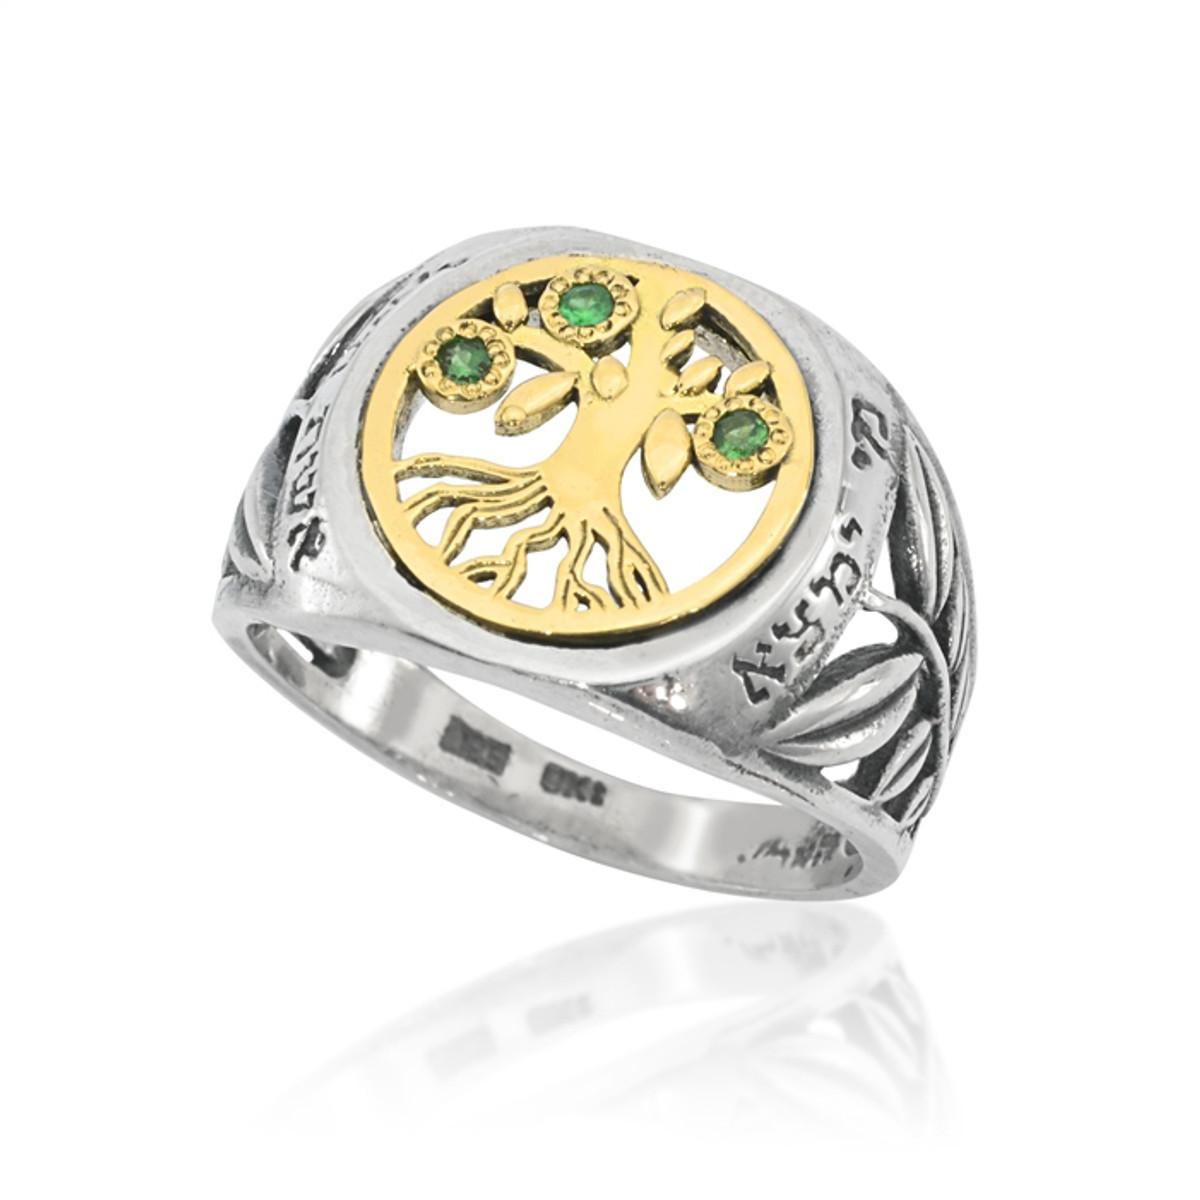 Gold Haari Kabbalah Jewelry life cycle tree ring with emeralds by HaAri  Ring